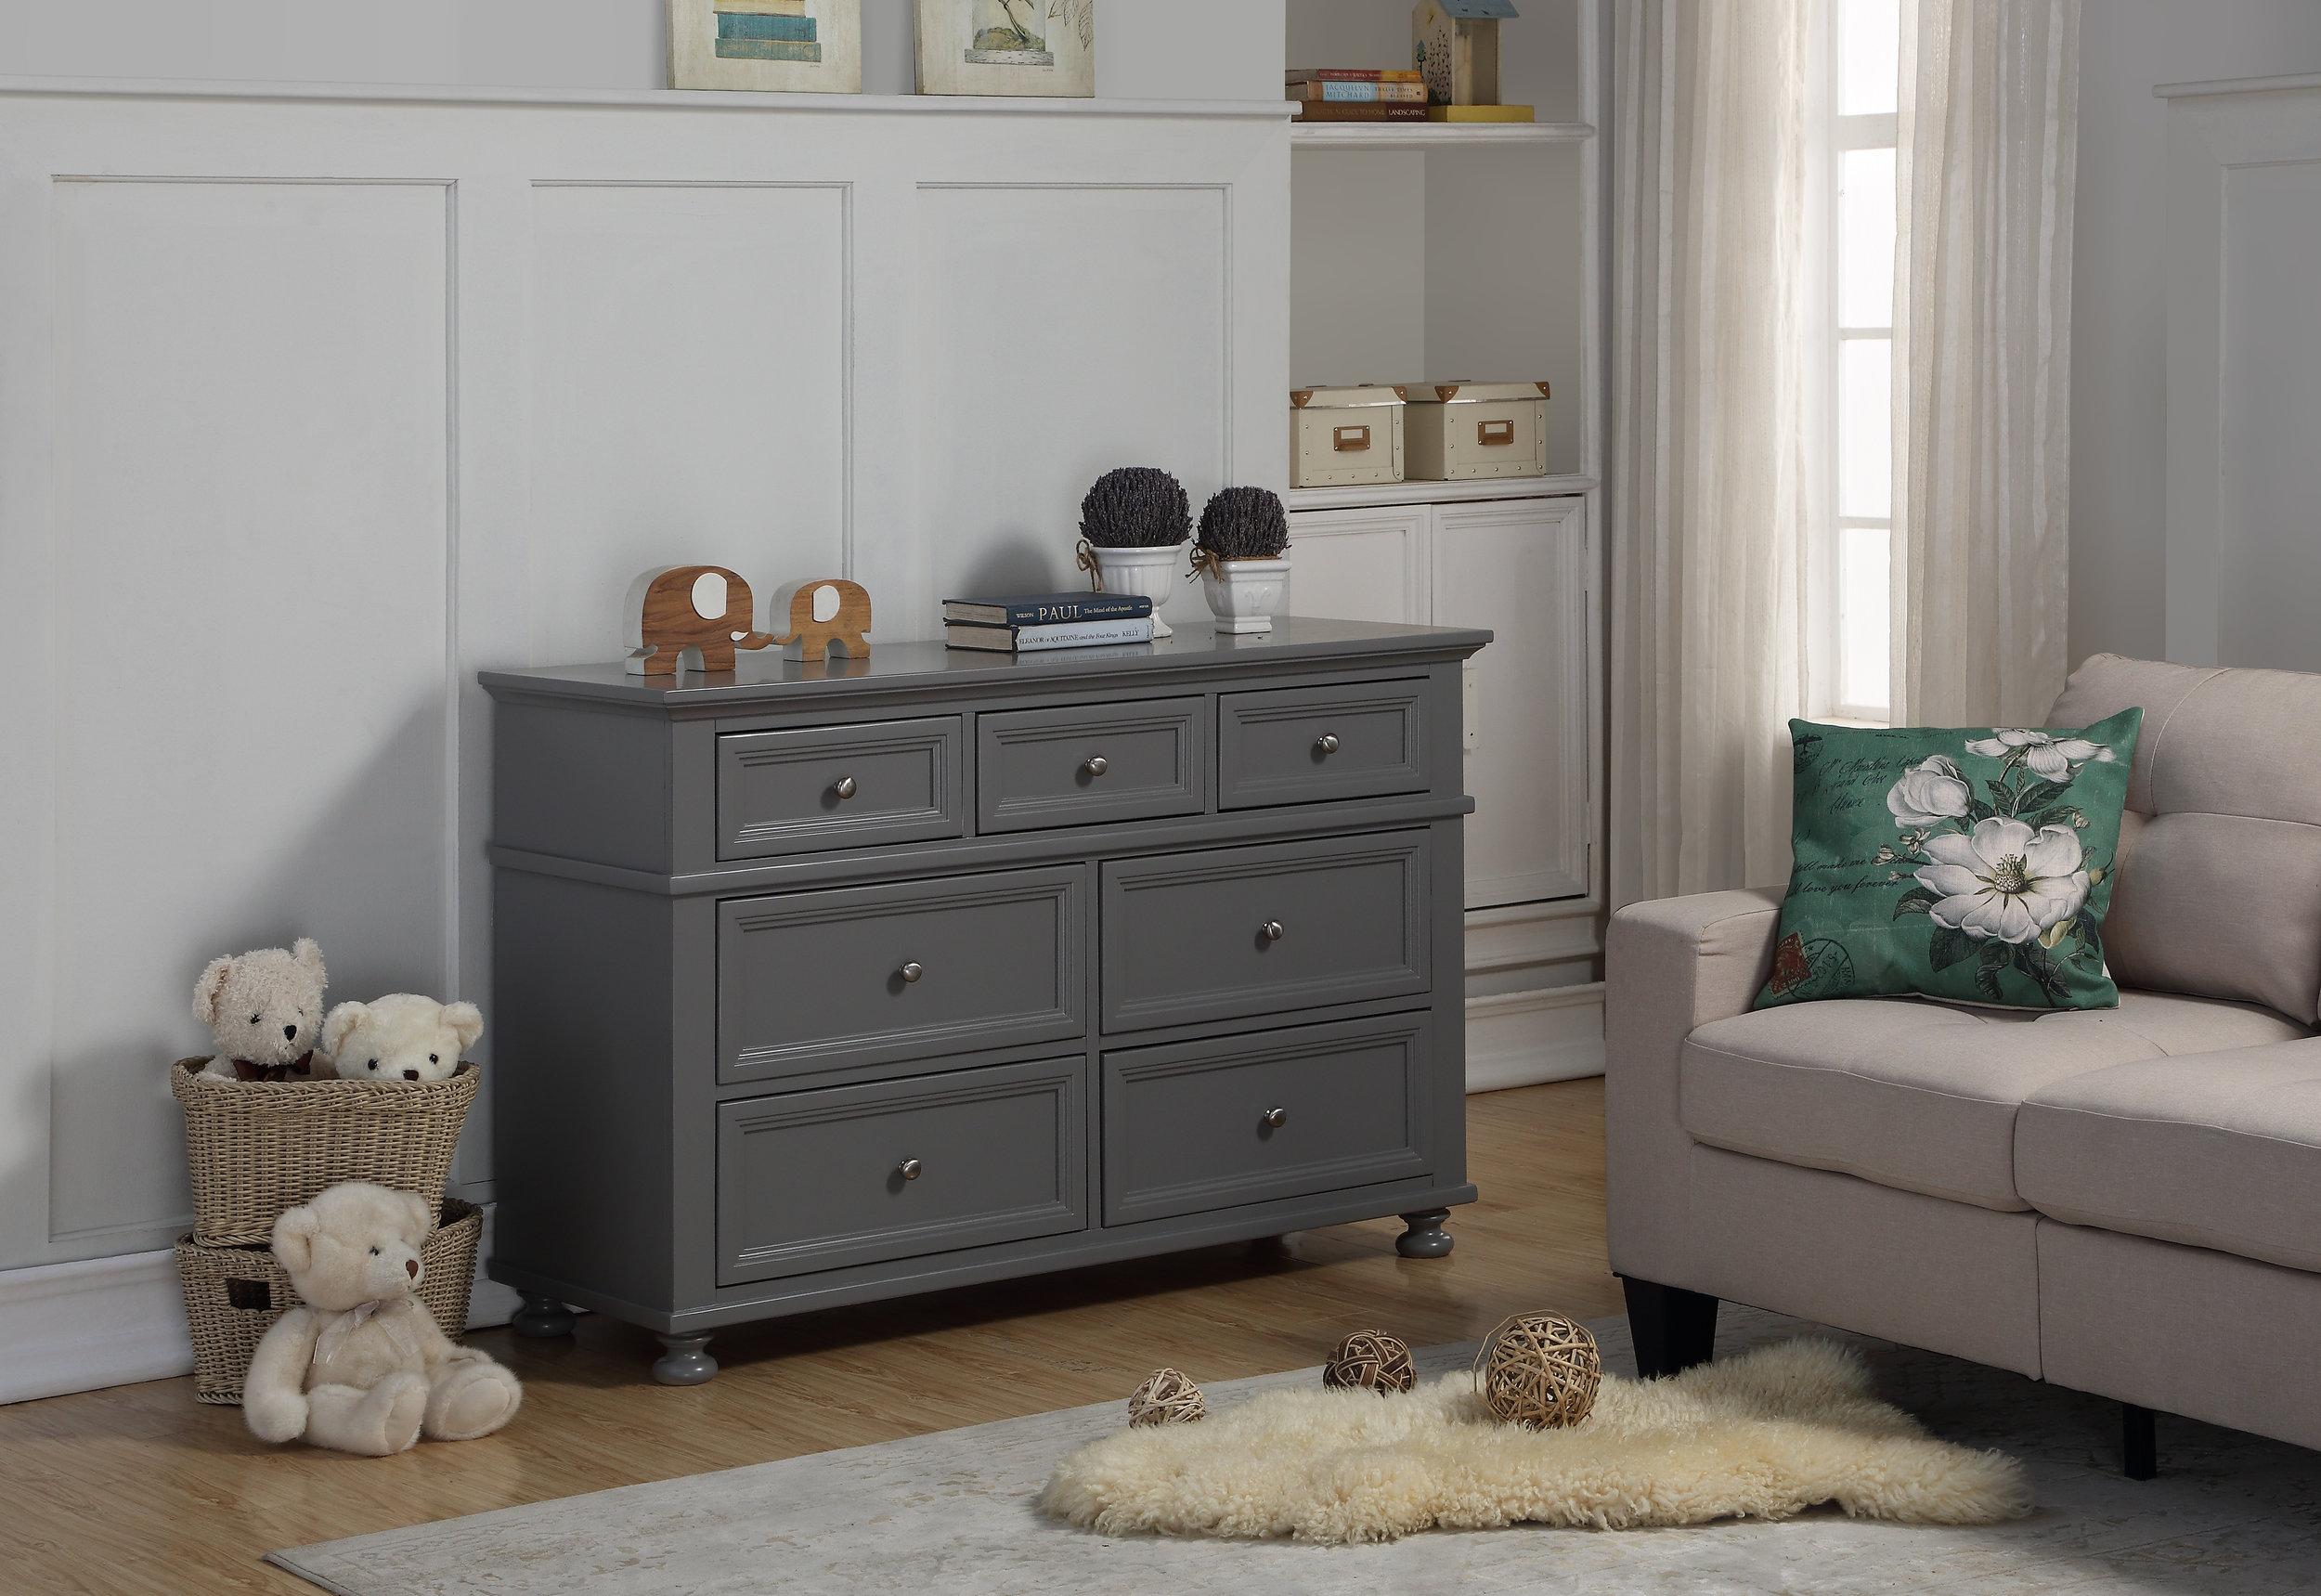 HR Belgian 7Dr Dresser- Pebble Grey.jpg